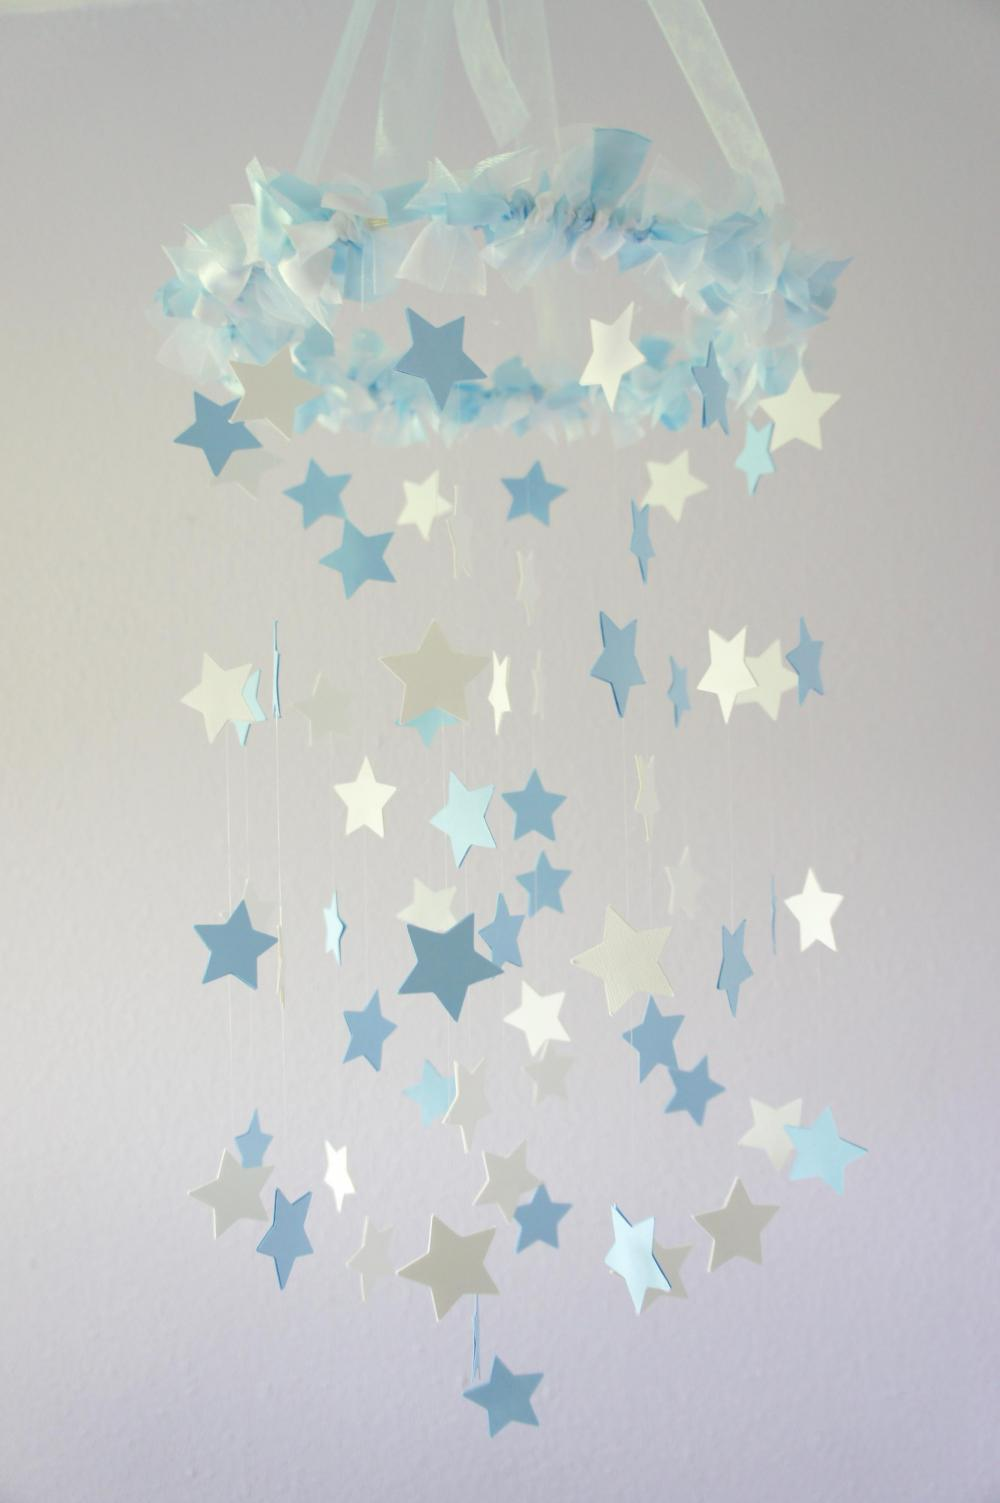 Baby Blue & White Star Mobile - Nursery Mobile, Baby Shower Gift, Nursery Decor